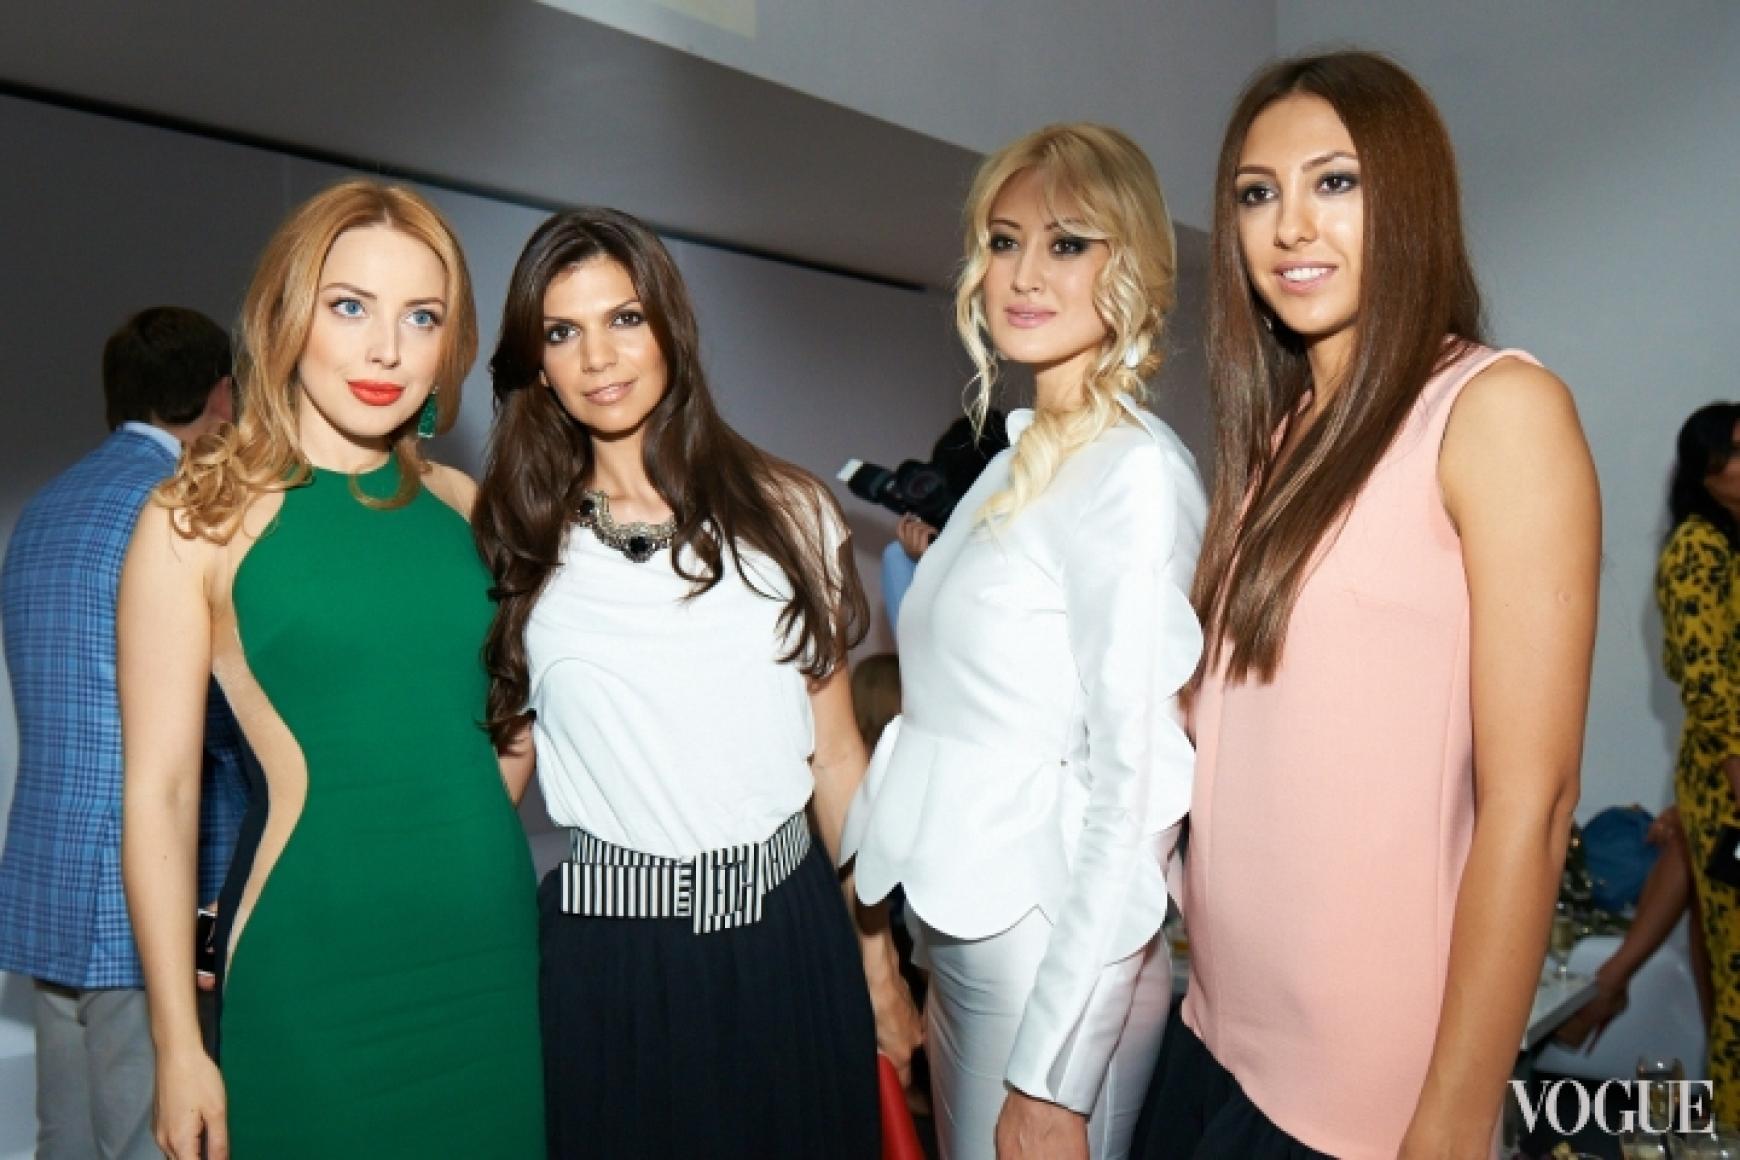 Дарья Диденко, Алина Алиева, Яна Югай, Яна Стрельцова